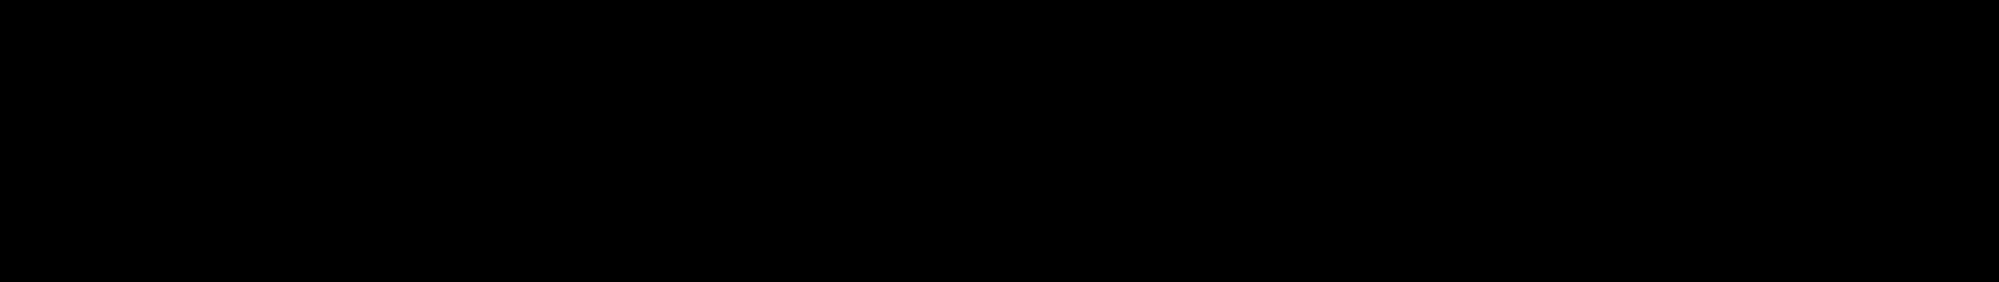 image68.png